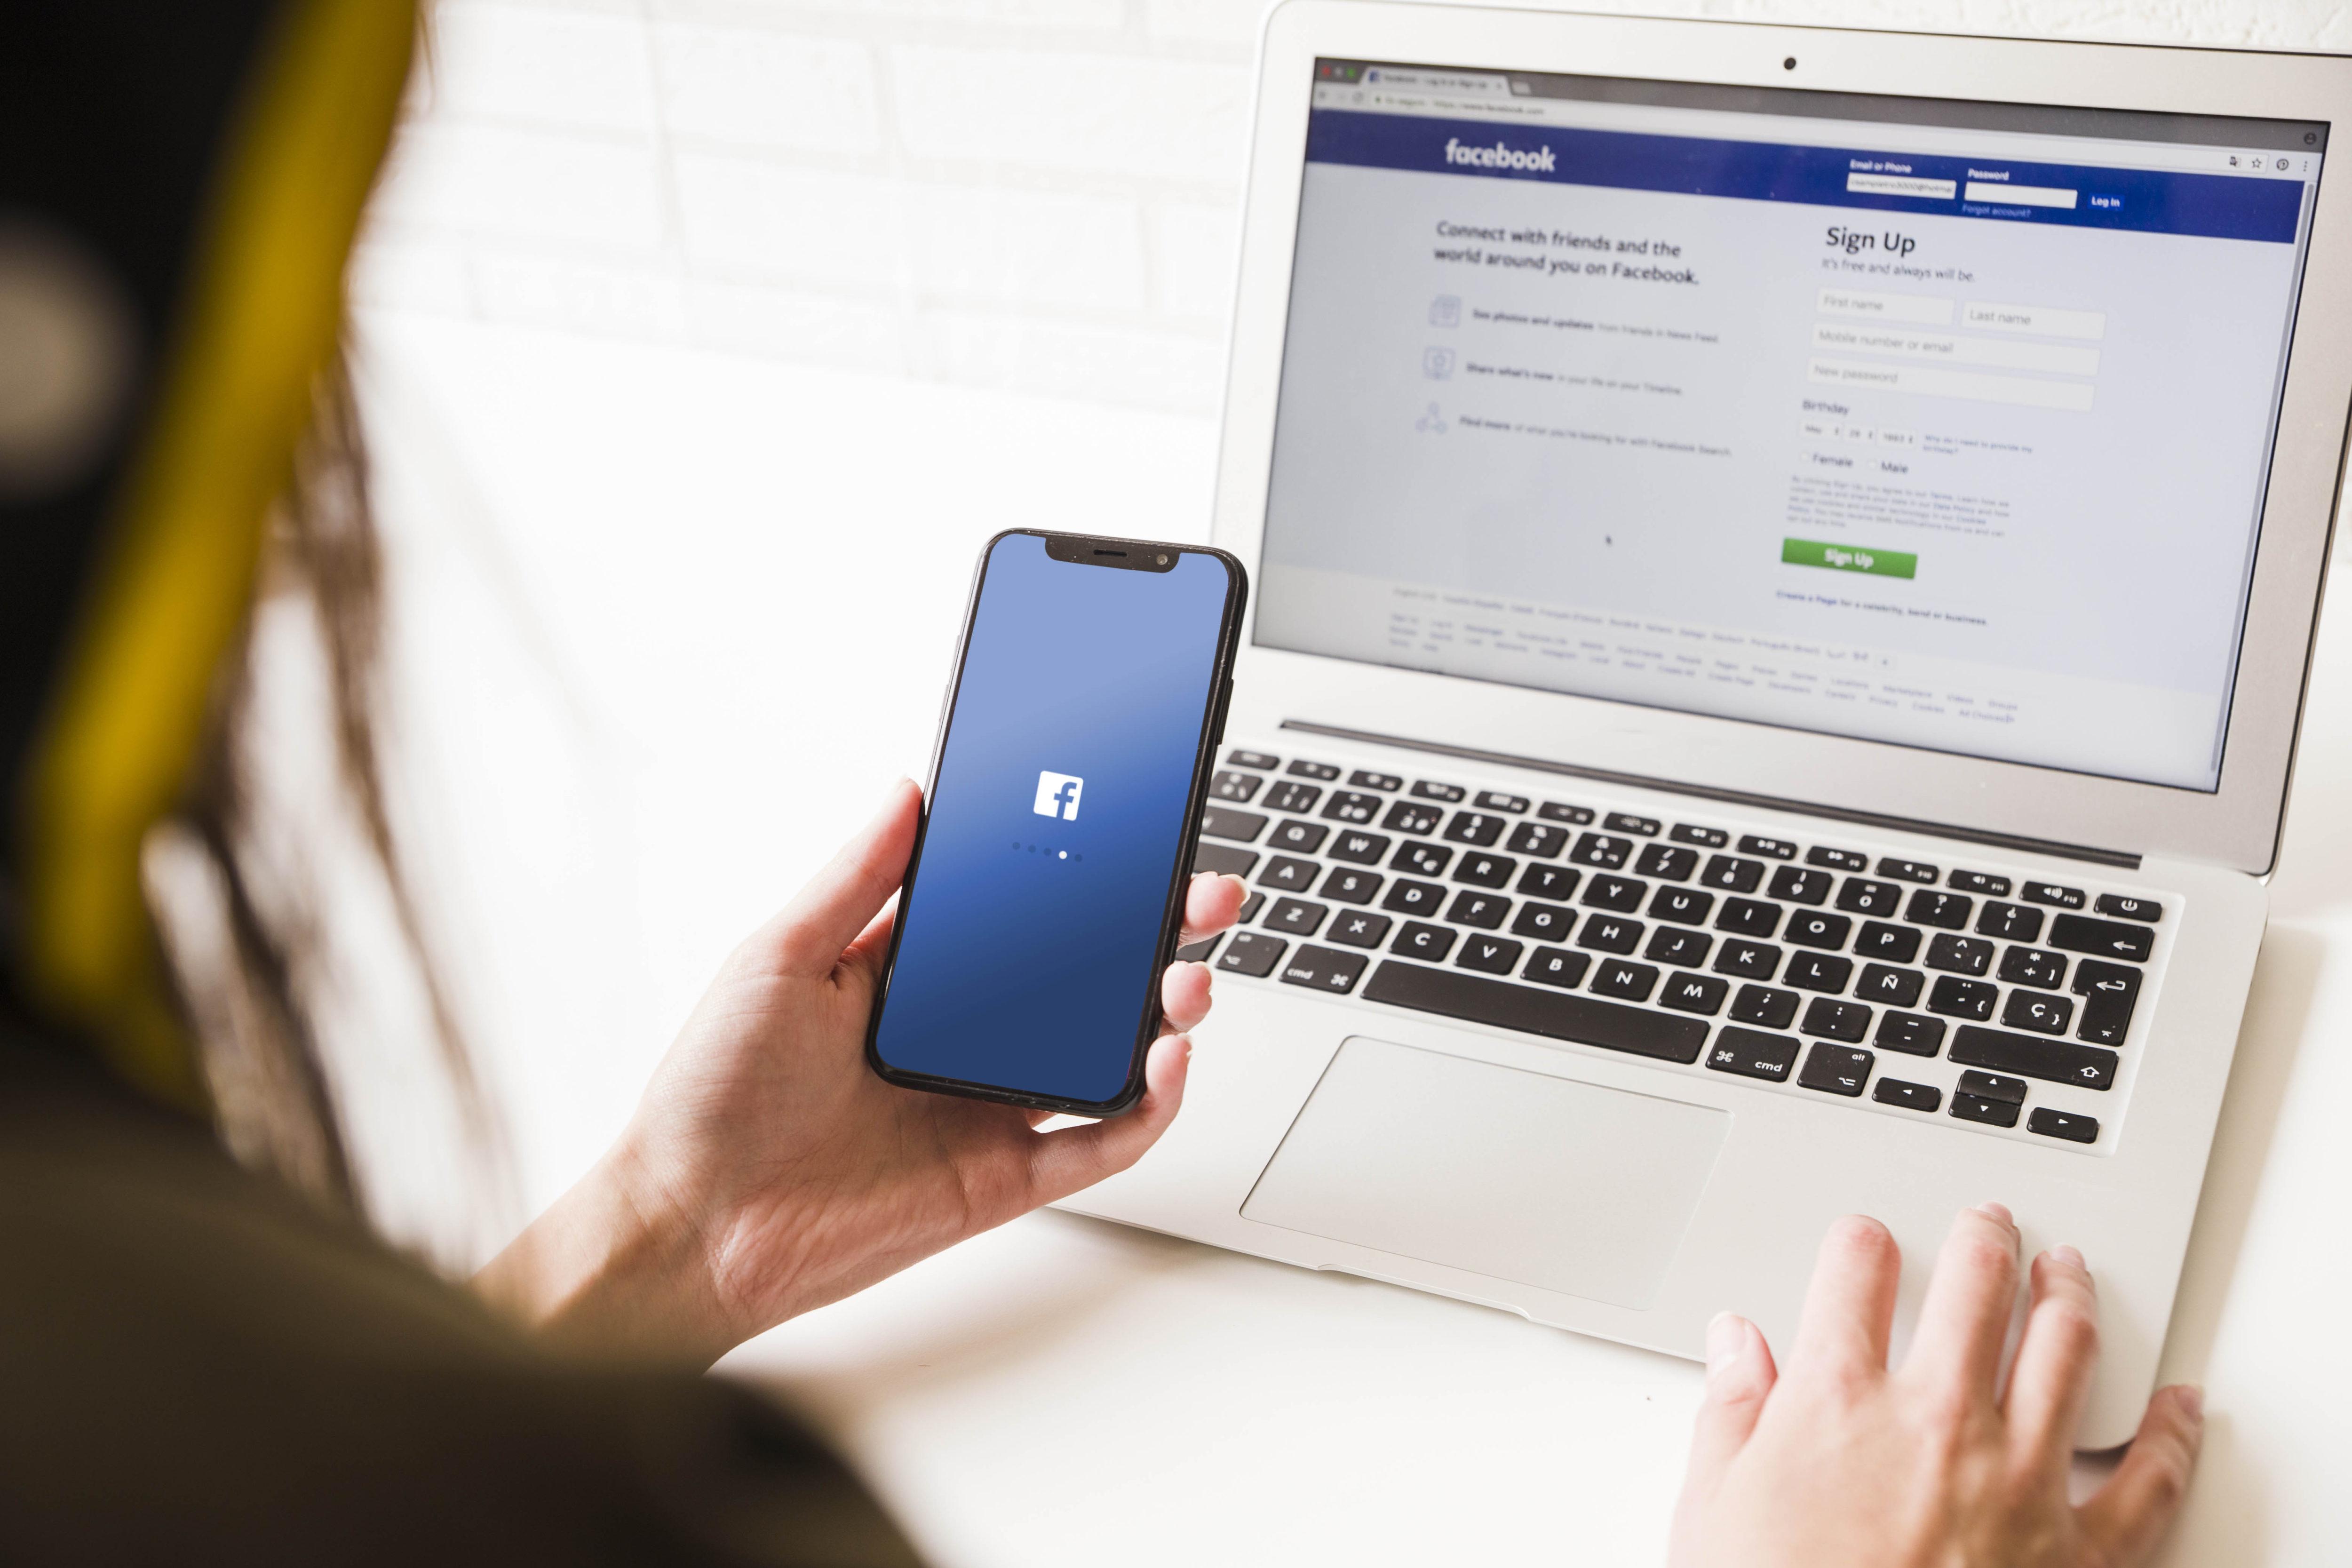 facebook na telefonie i komputerze